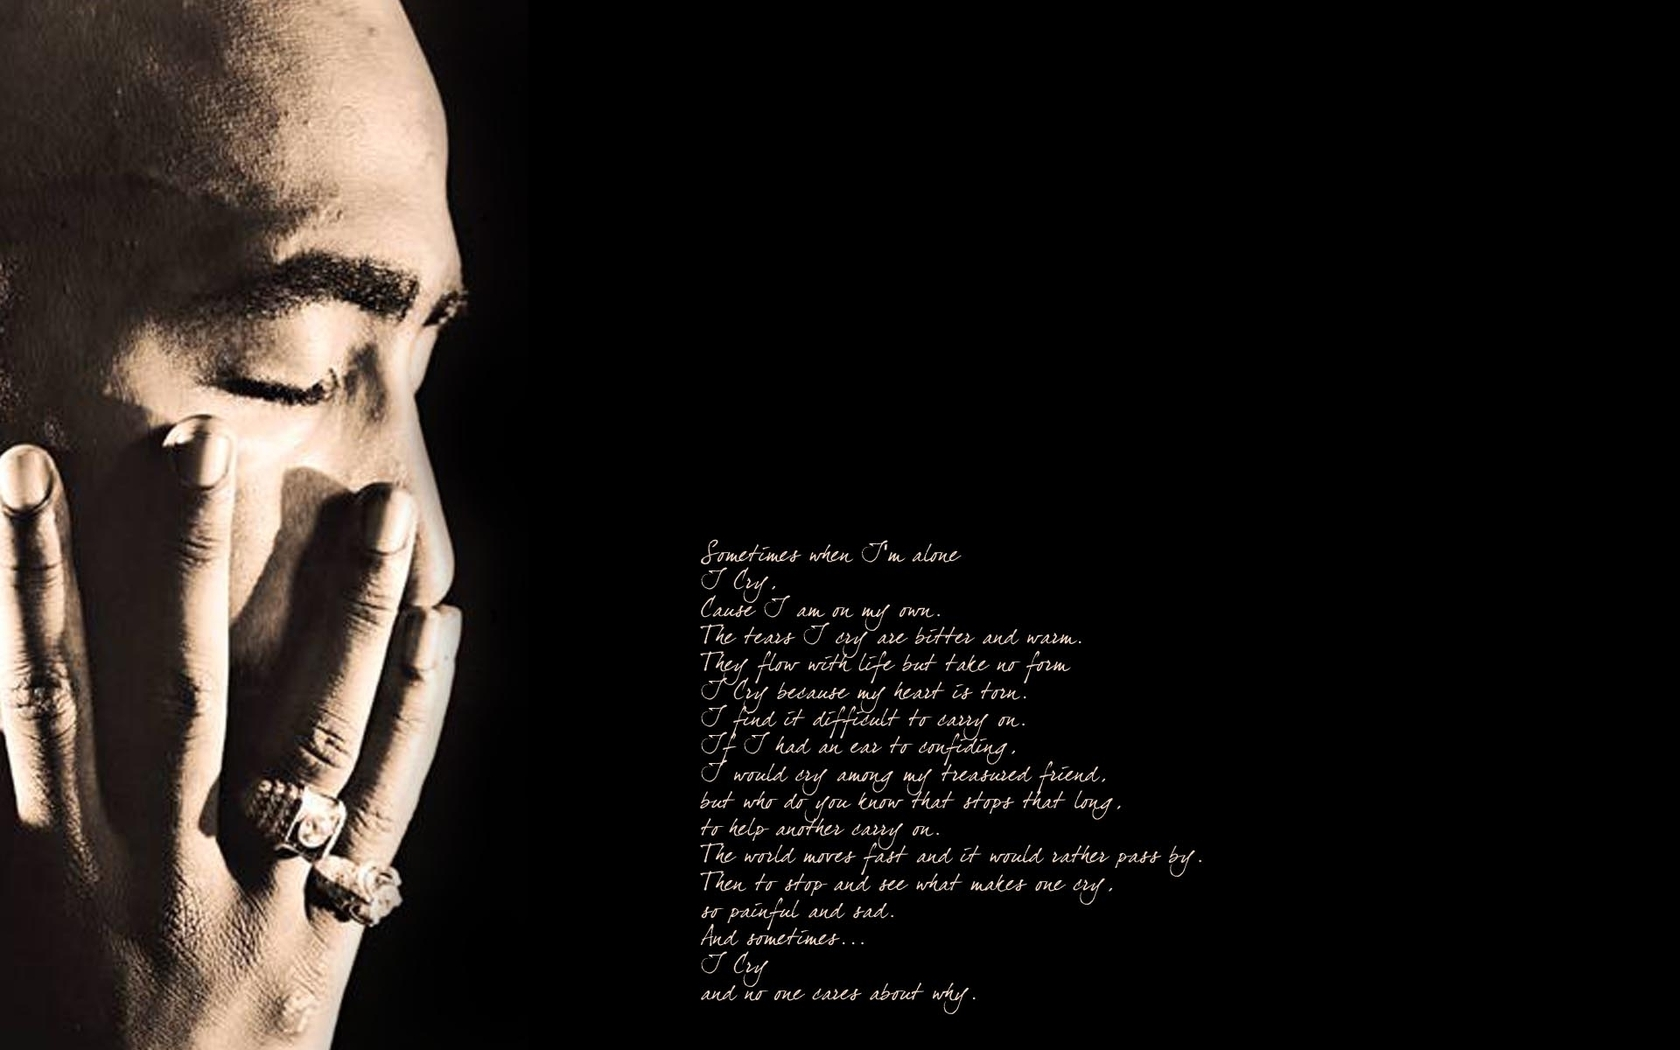 Tupac Shakur quote wallpaper 1680x1050